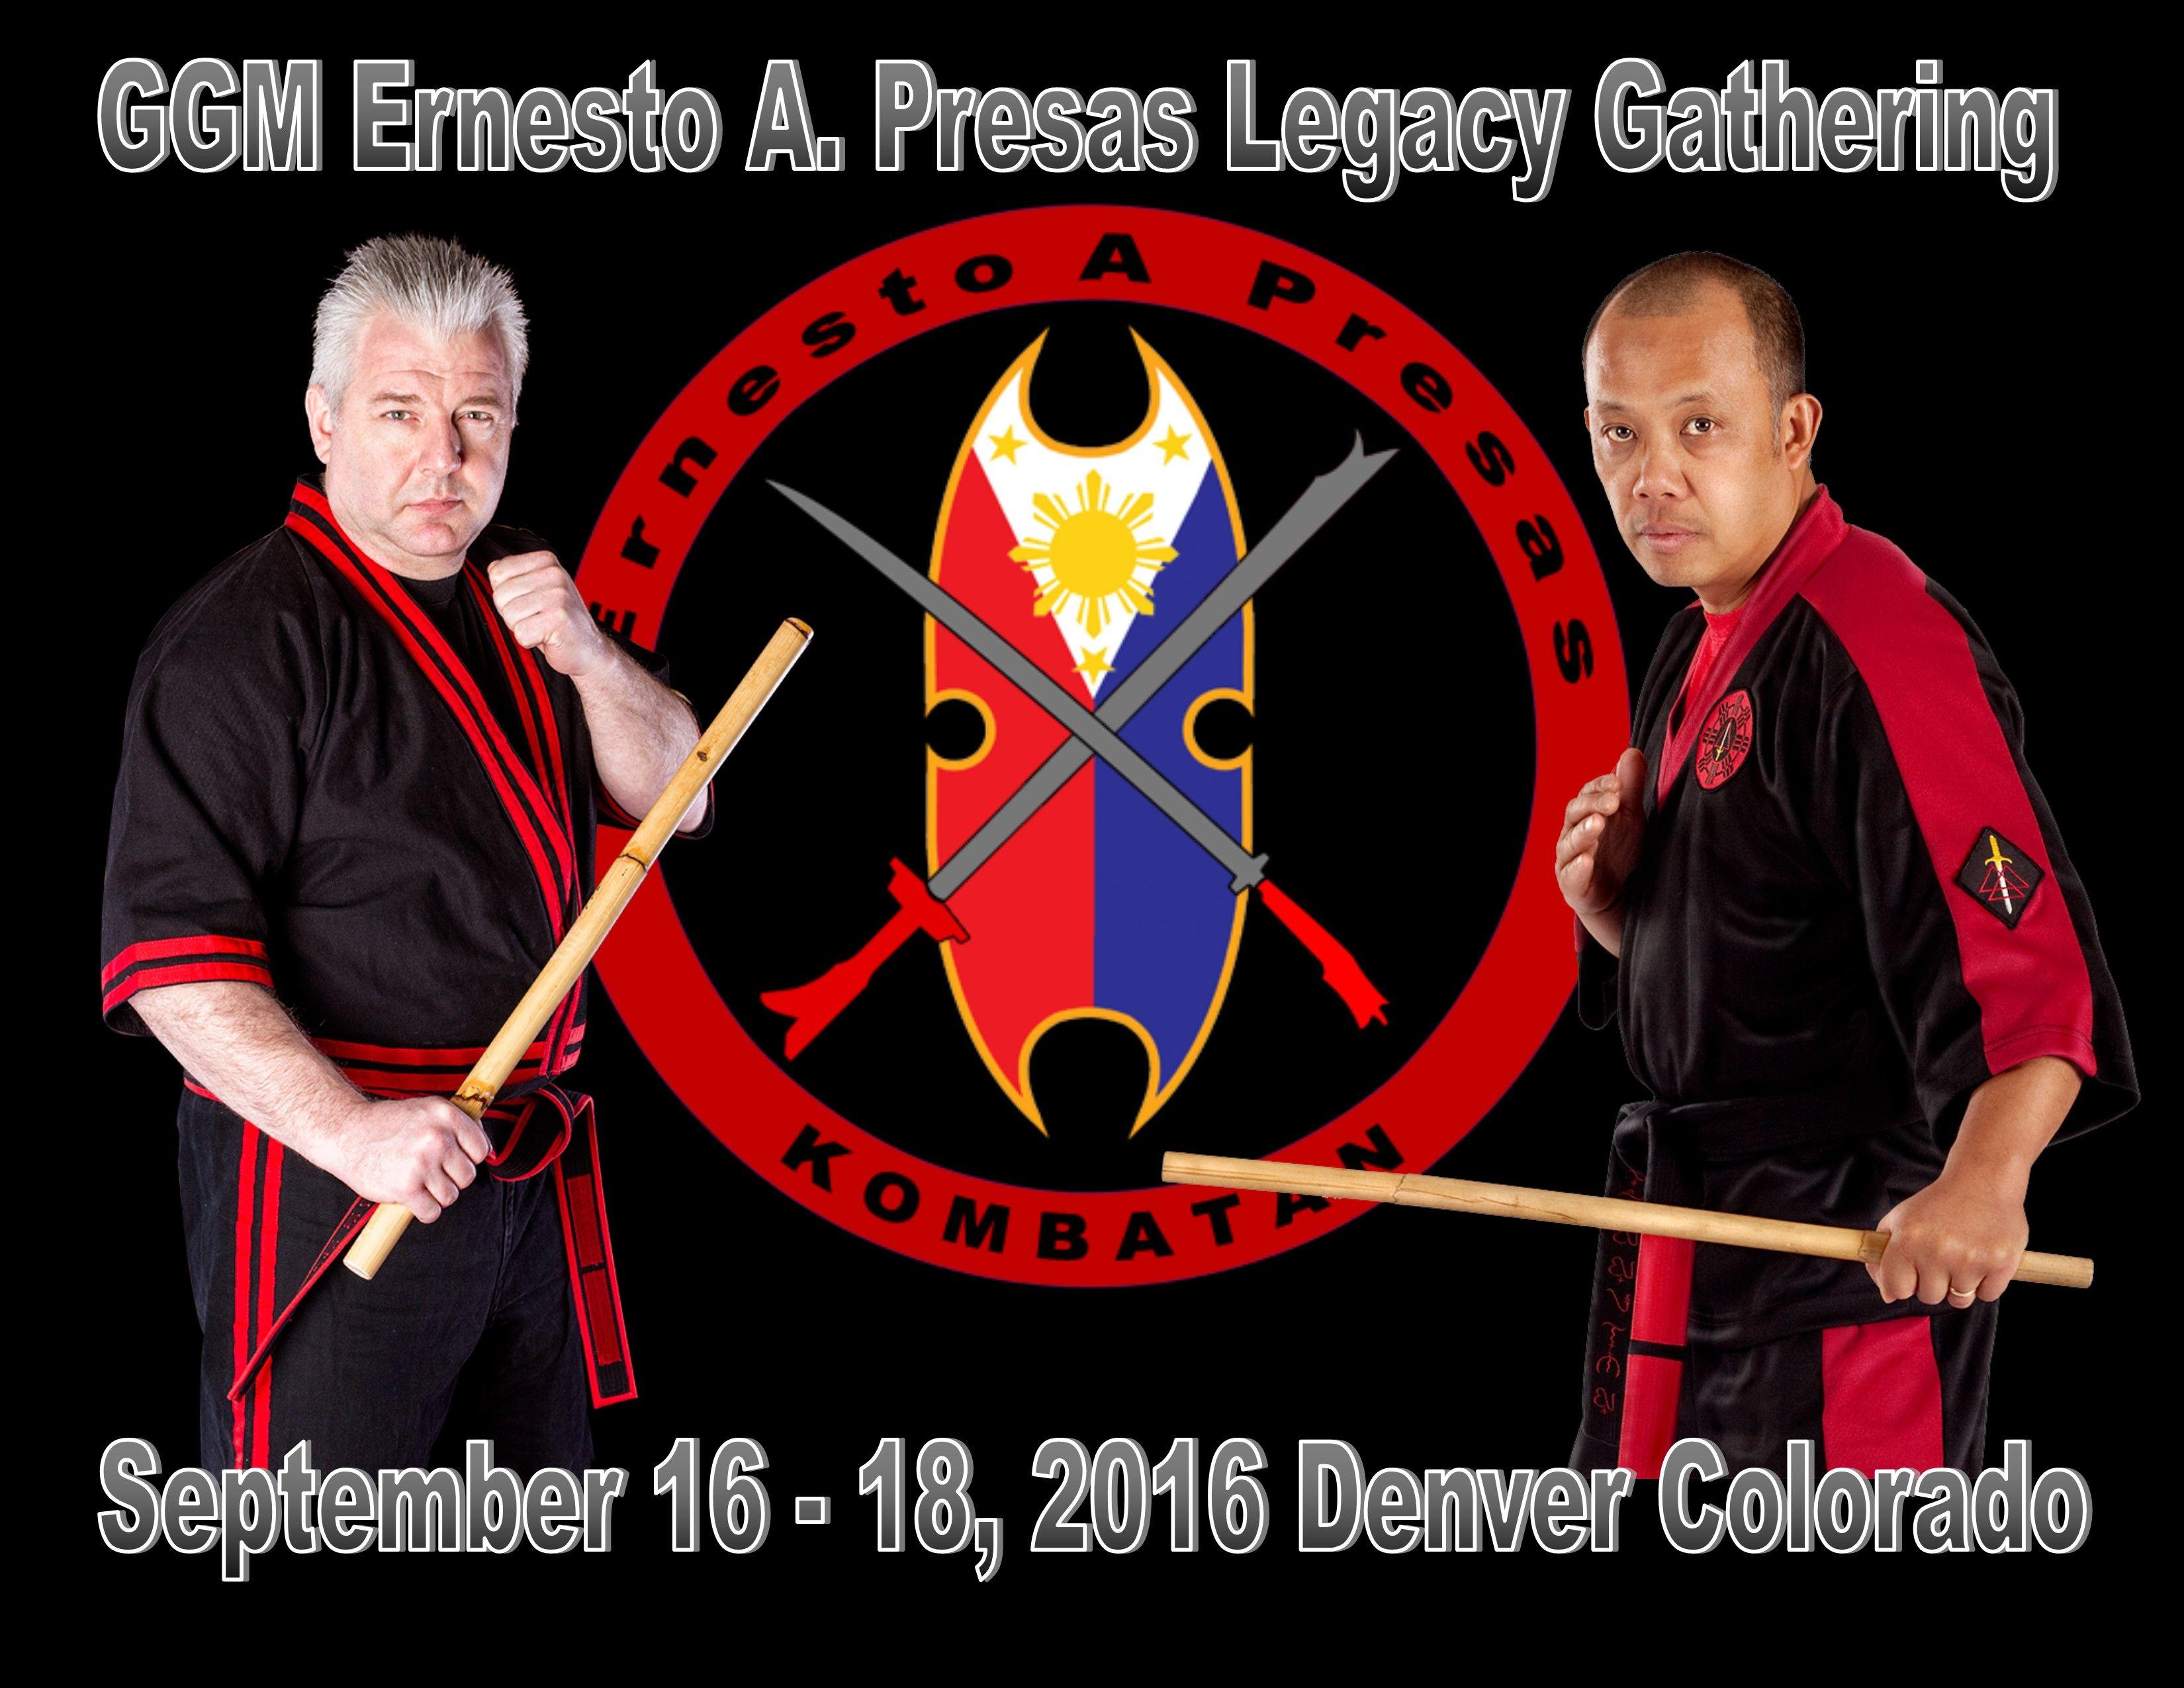 GGM Ernesto A. Presas Legacy Gathering.jpg